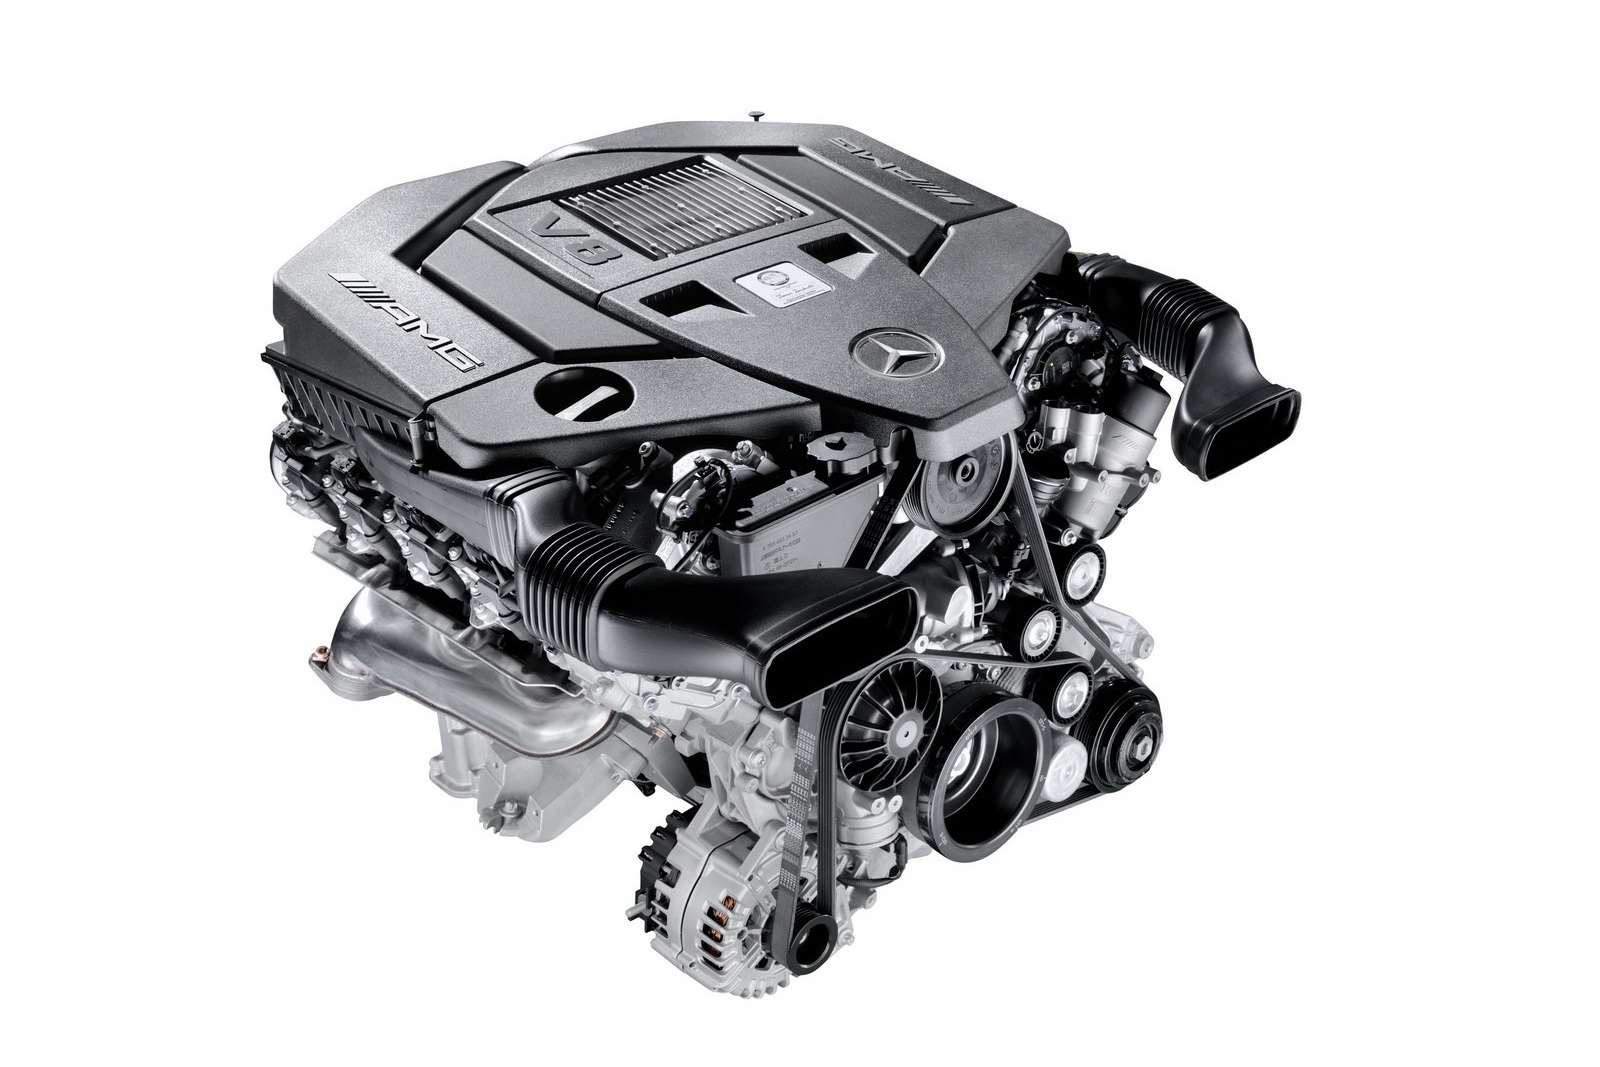 Mercedes slk 55 amg z v8 fot lipiec 2011